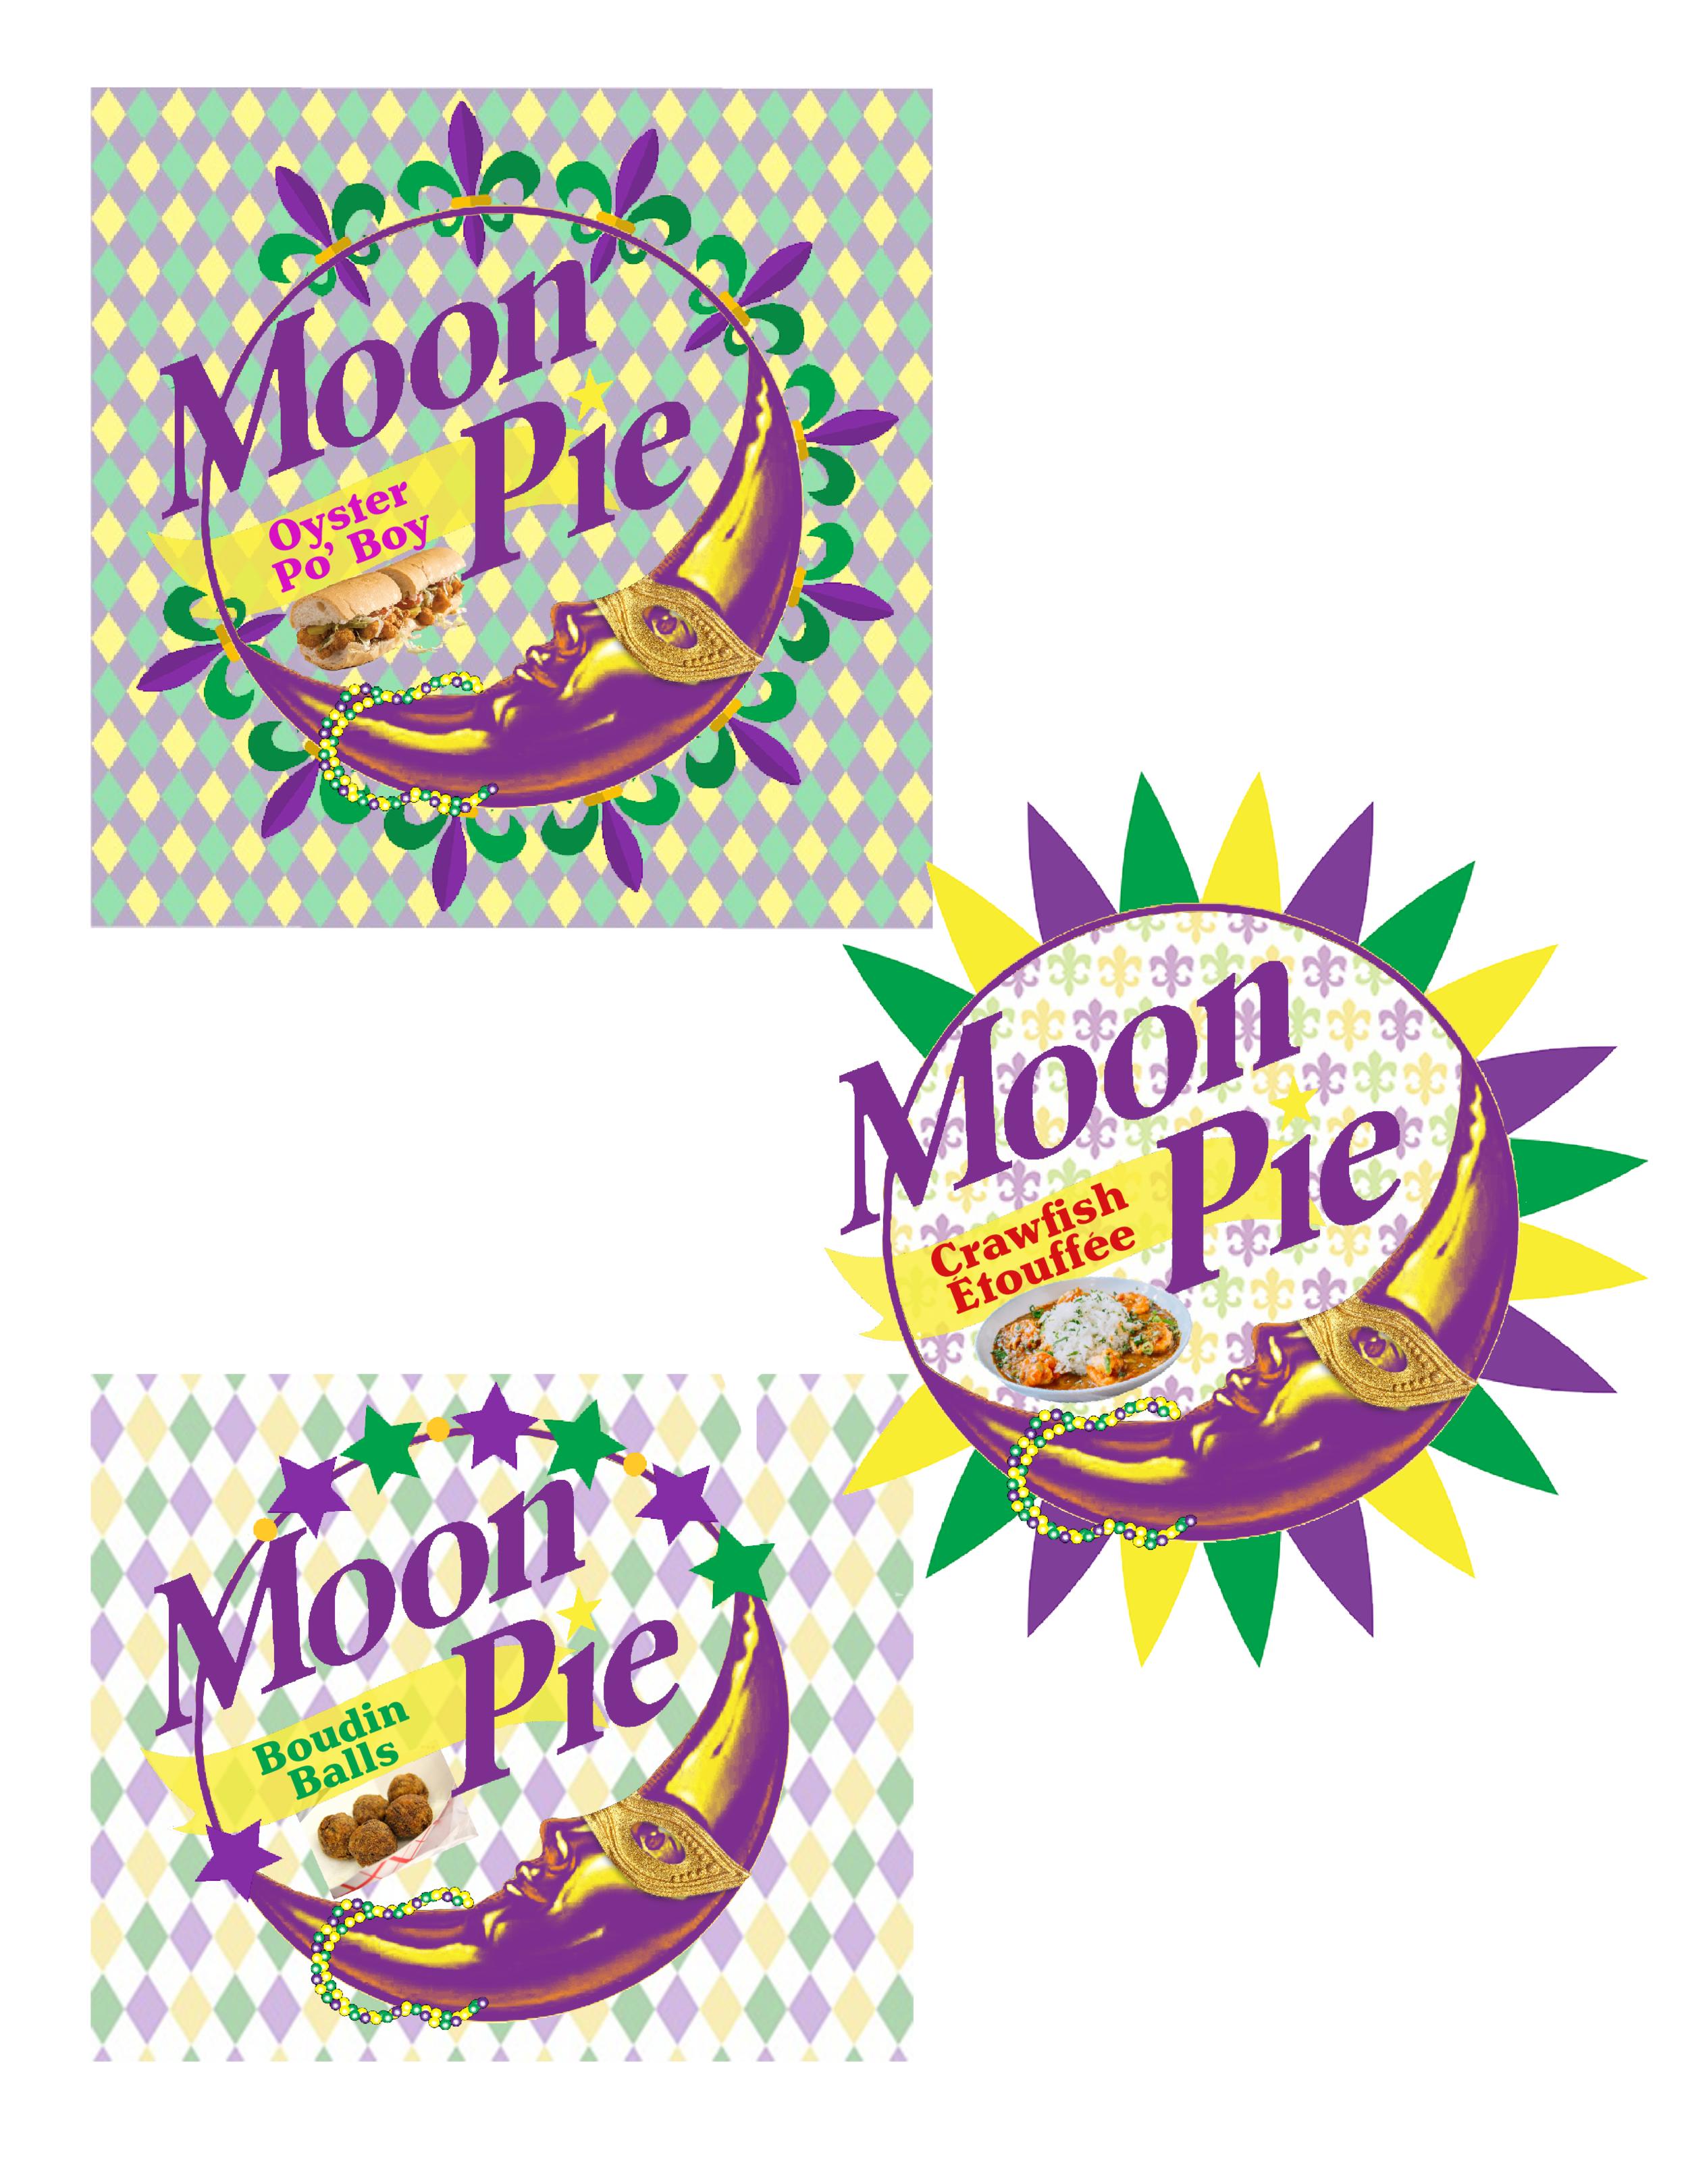 moon pie logo6.png